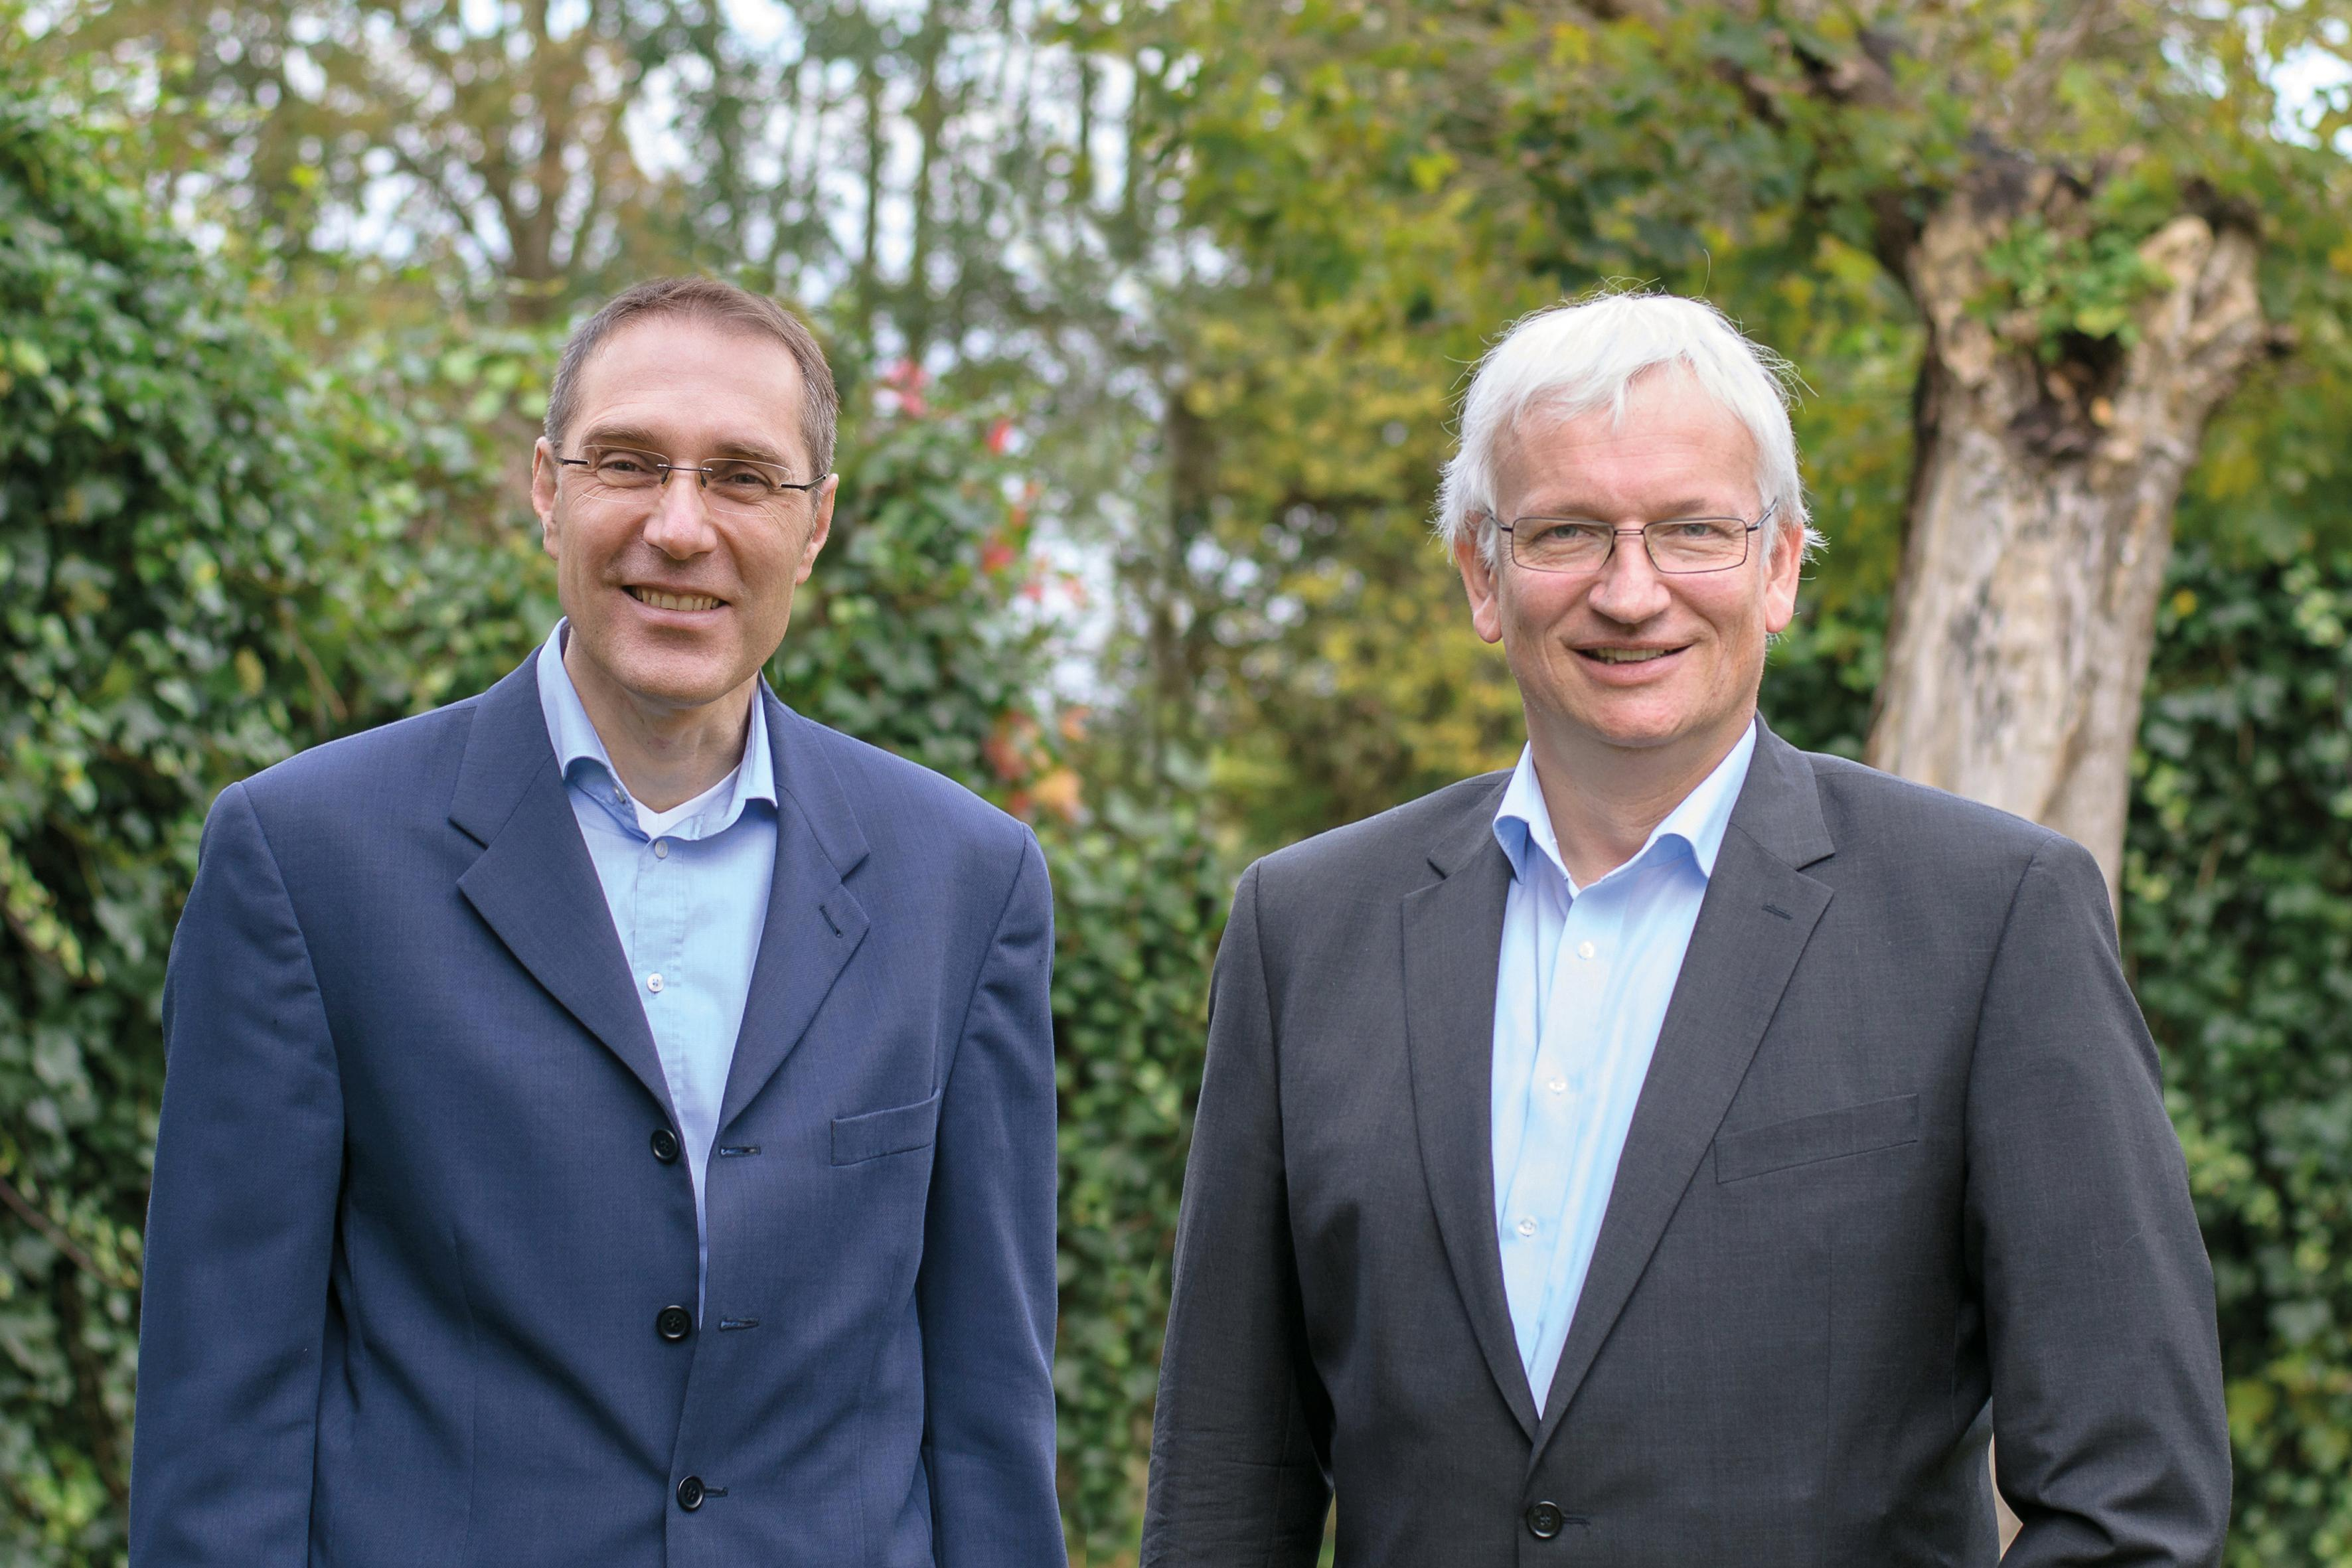 sascha müller kraenner in new dual leadership of deutsche